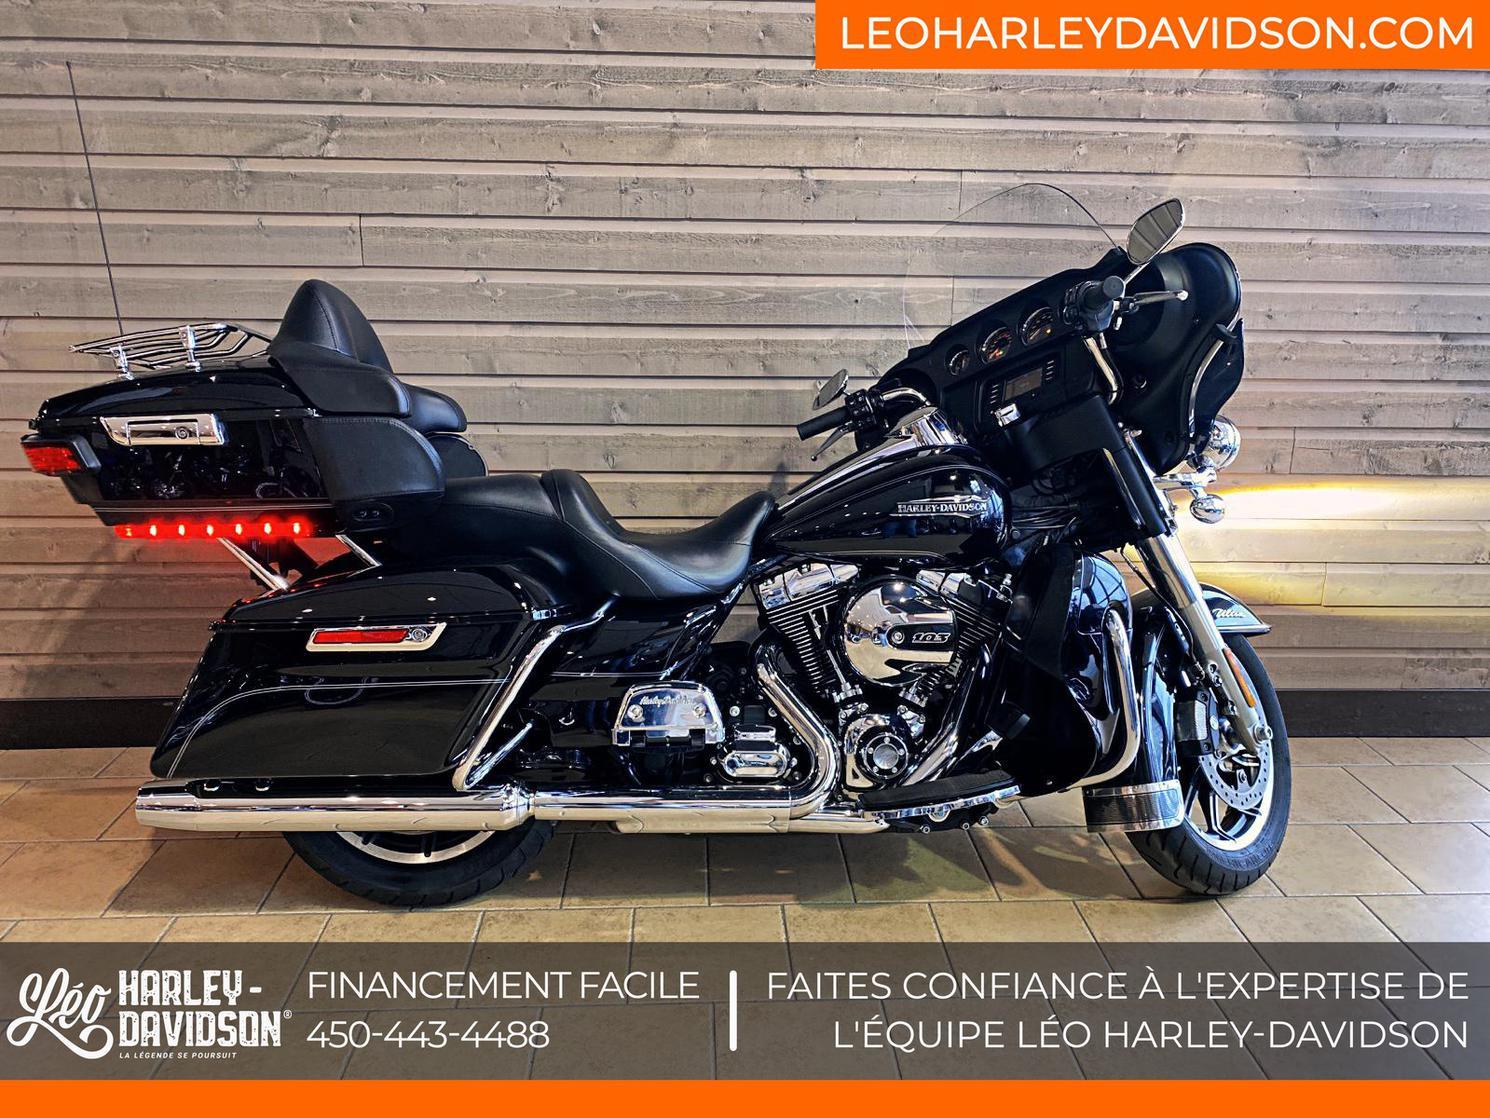 Harley-Davidson FL-Ultra Classic Electra Gilde 2016 - FLHTCU